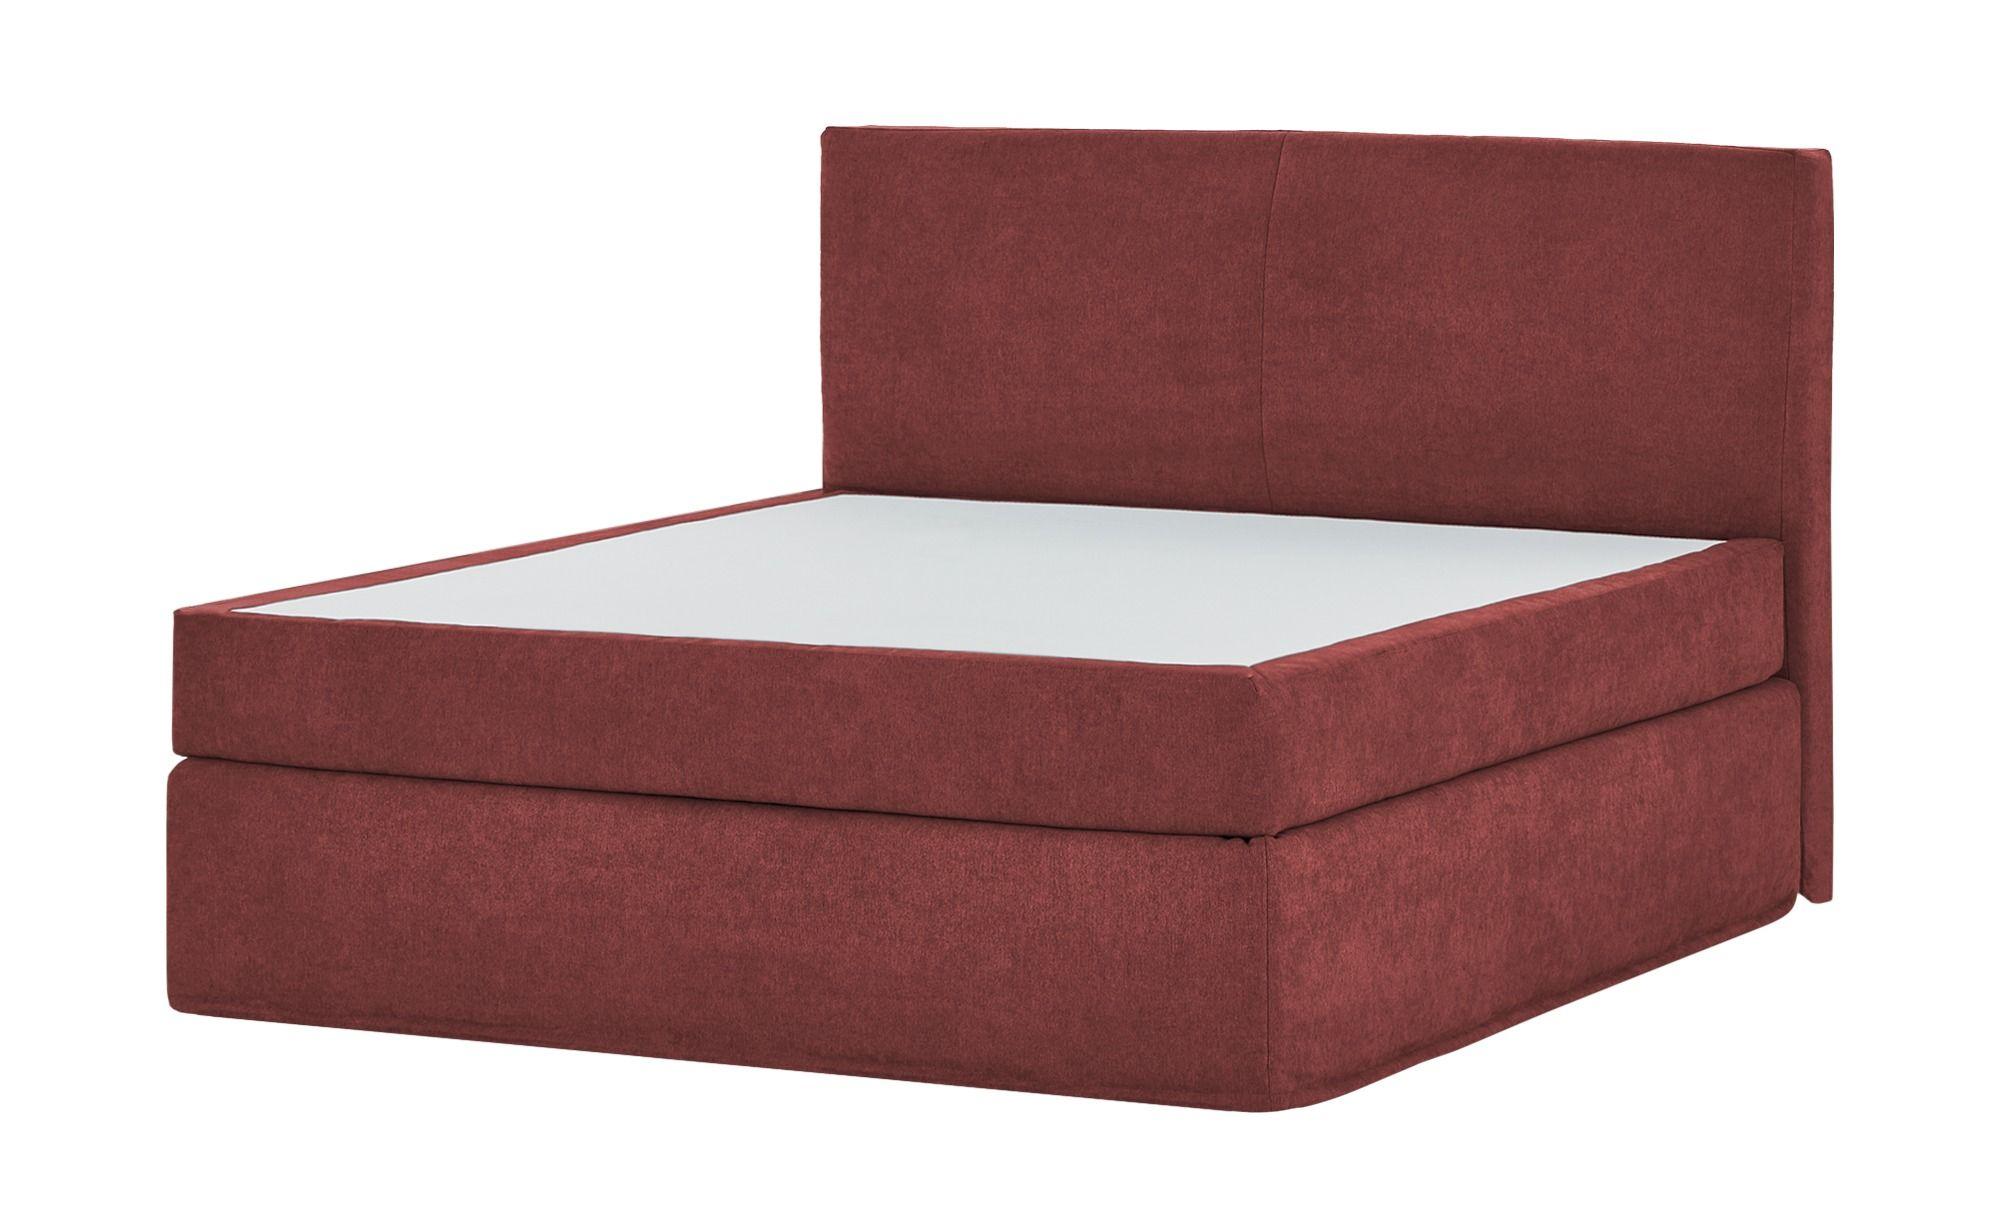 Photo of Boxi Classic box spring bed, found at Möbel Höffner